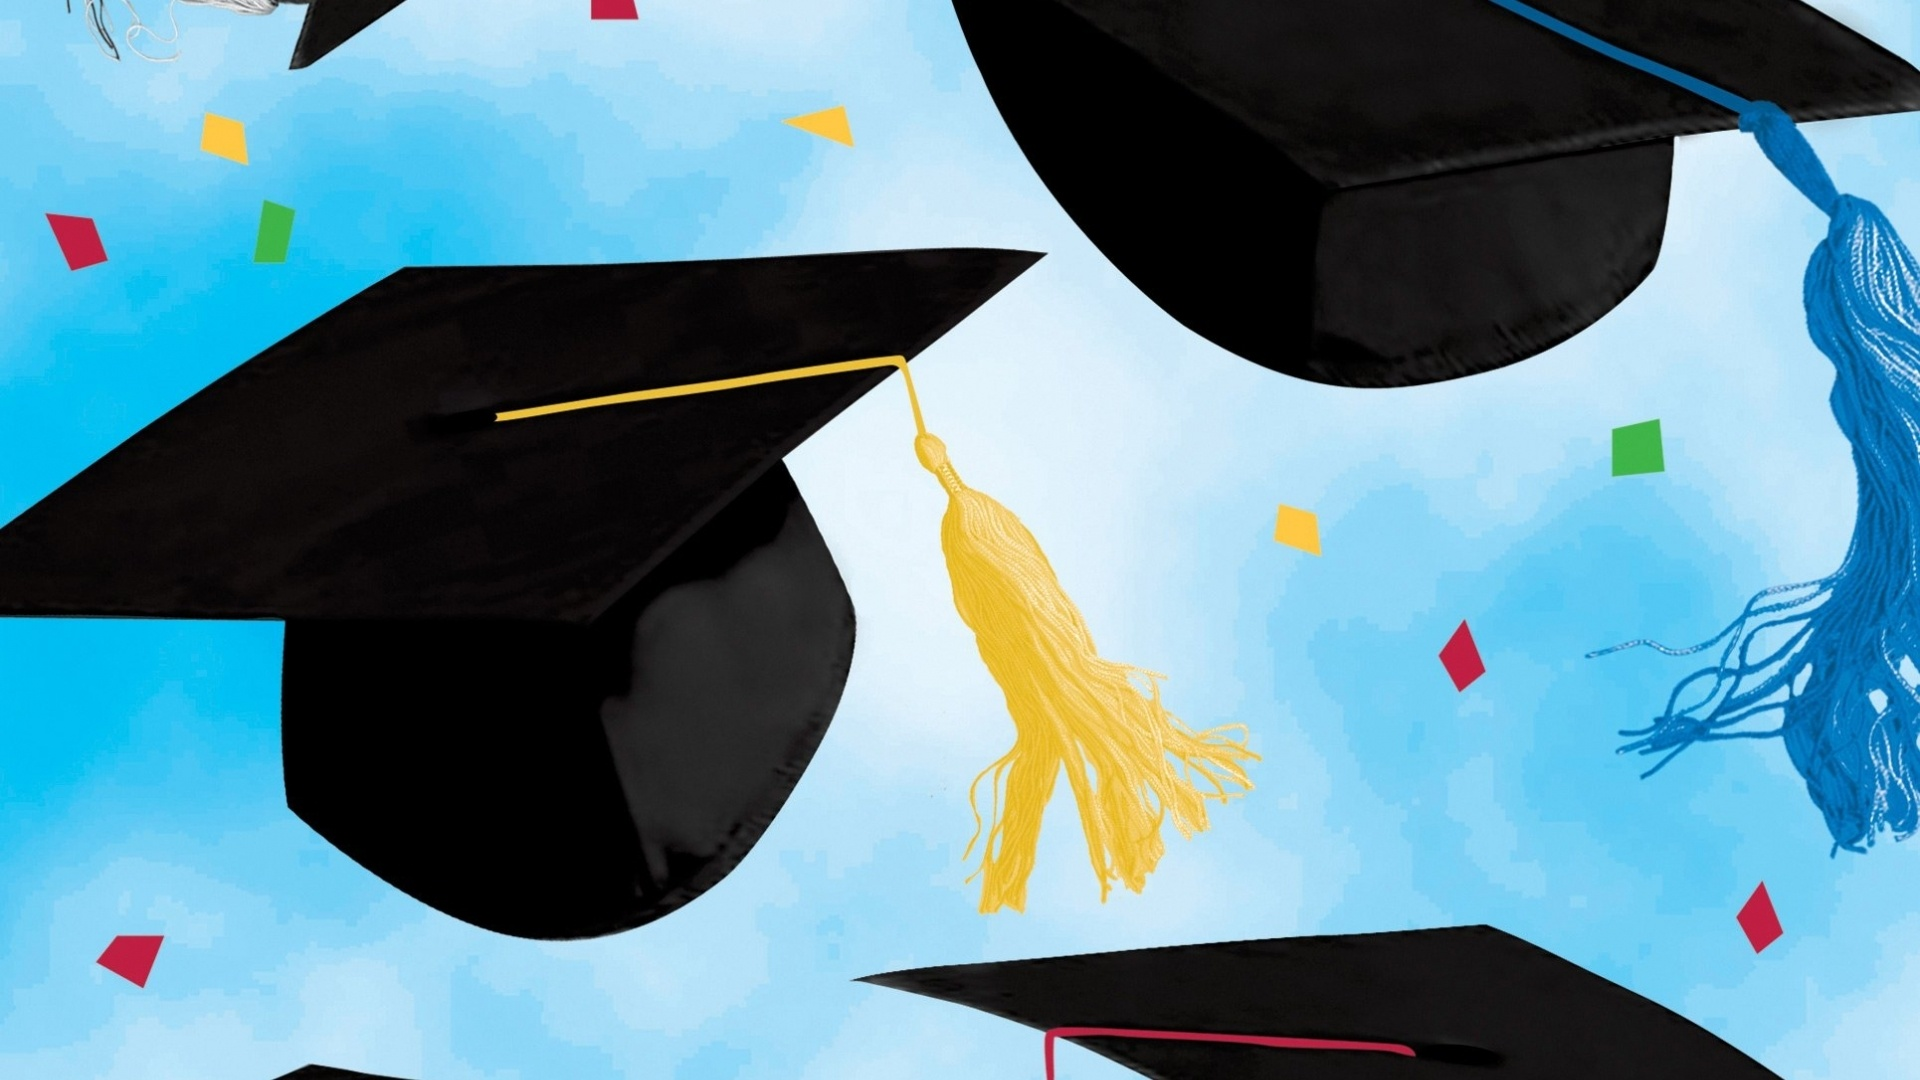 Graduation Wallpaper Picture hd